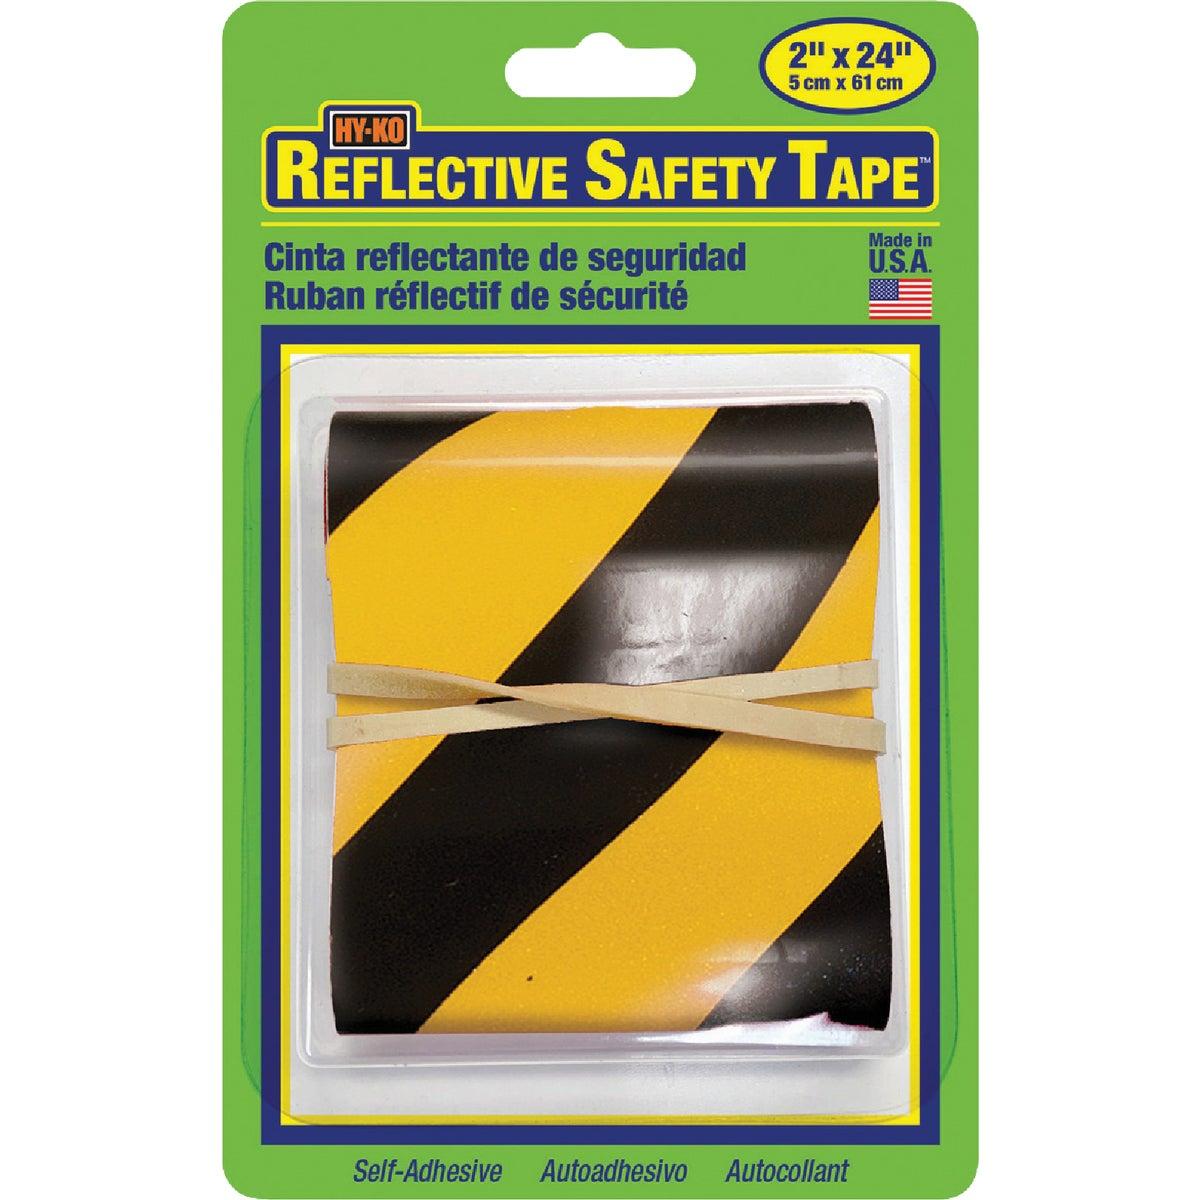 Yel/Blk Reflective Tape